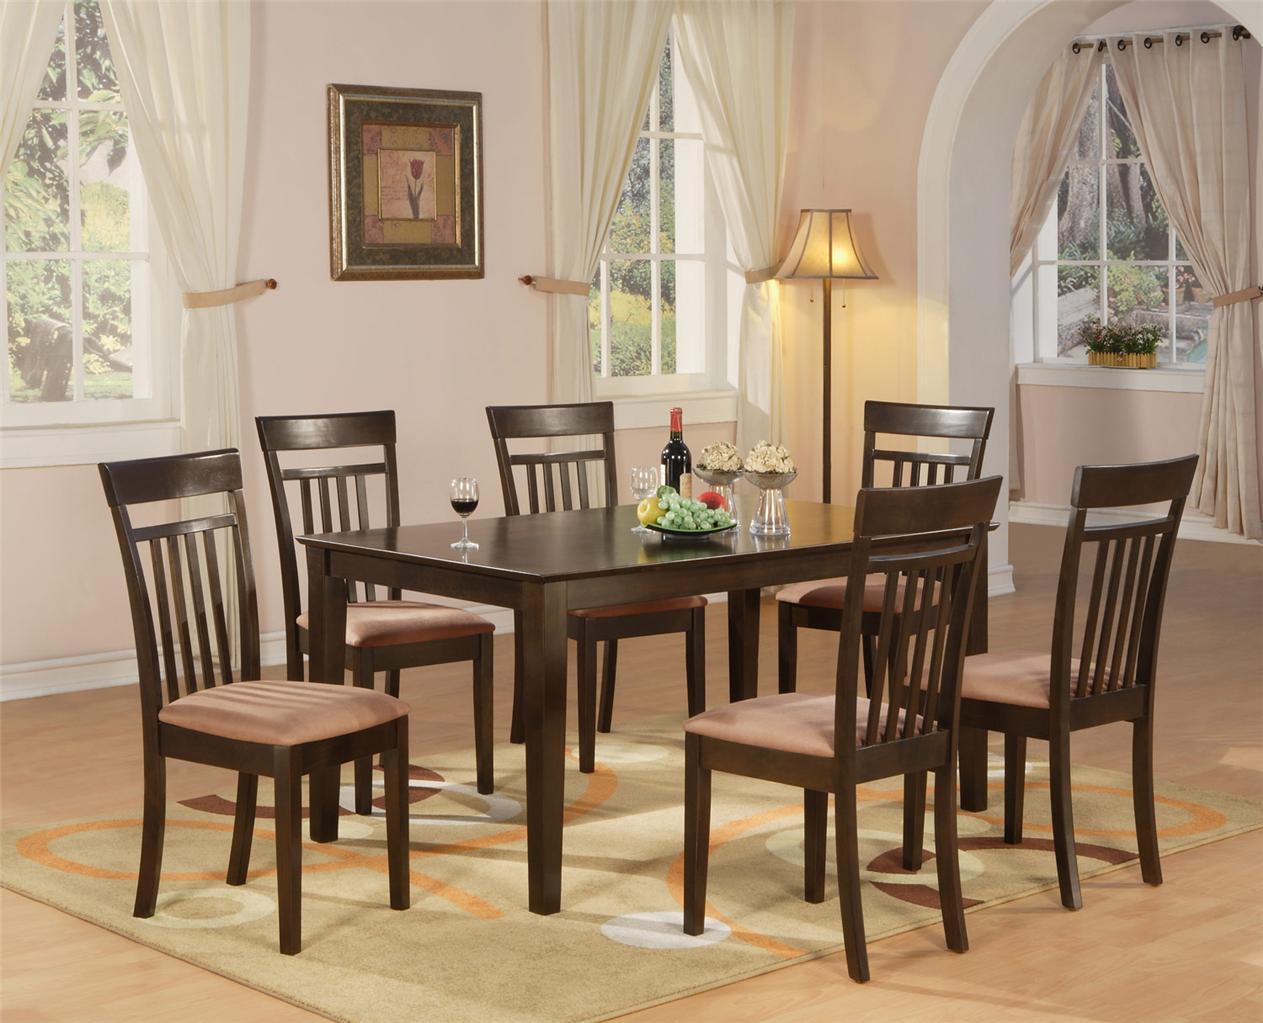 kitchen dining sets photo - 1